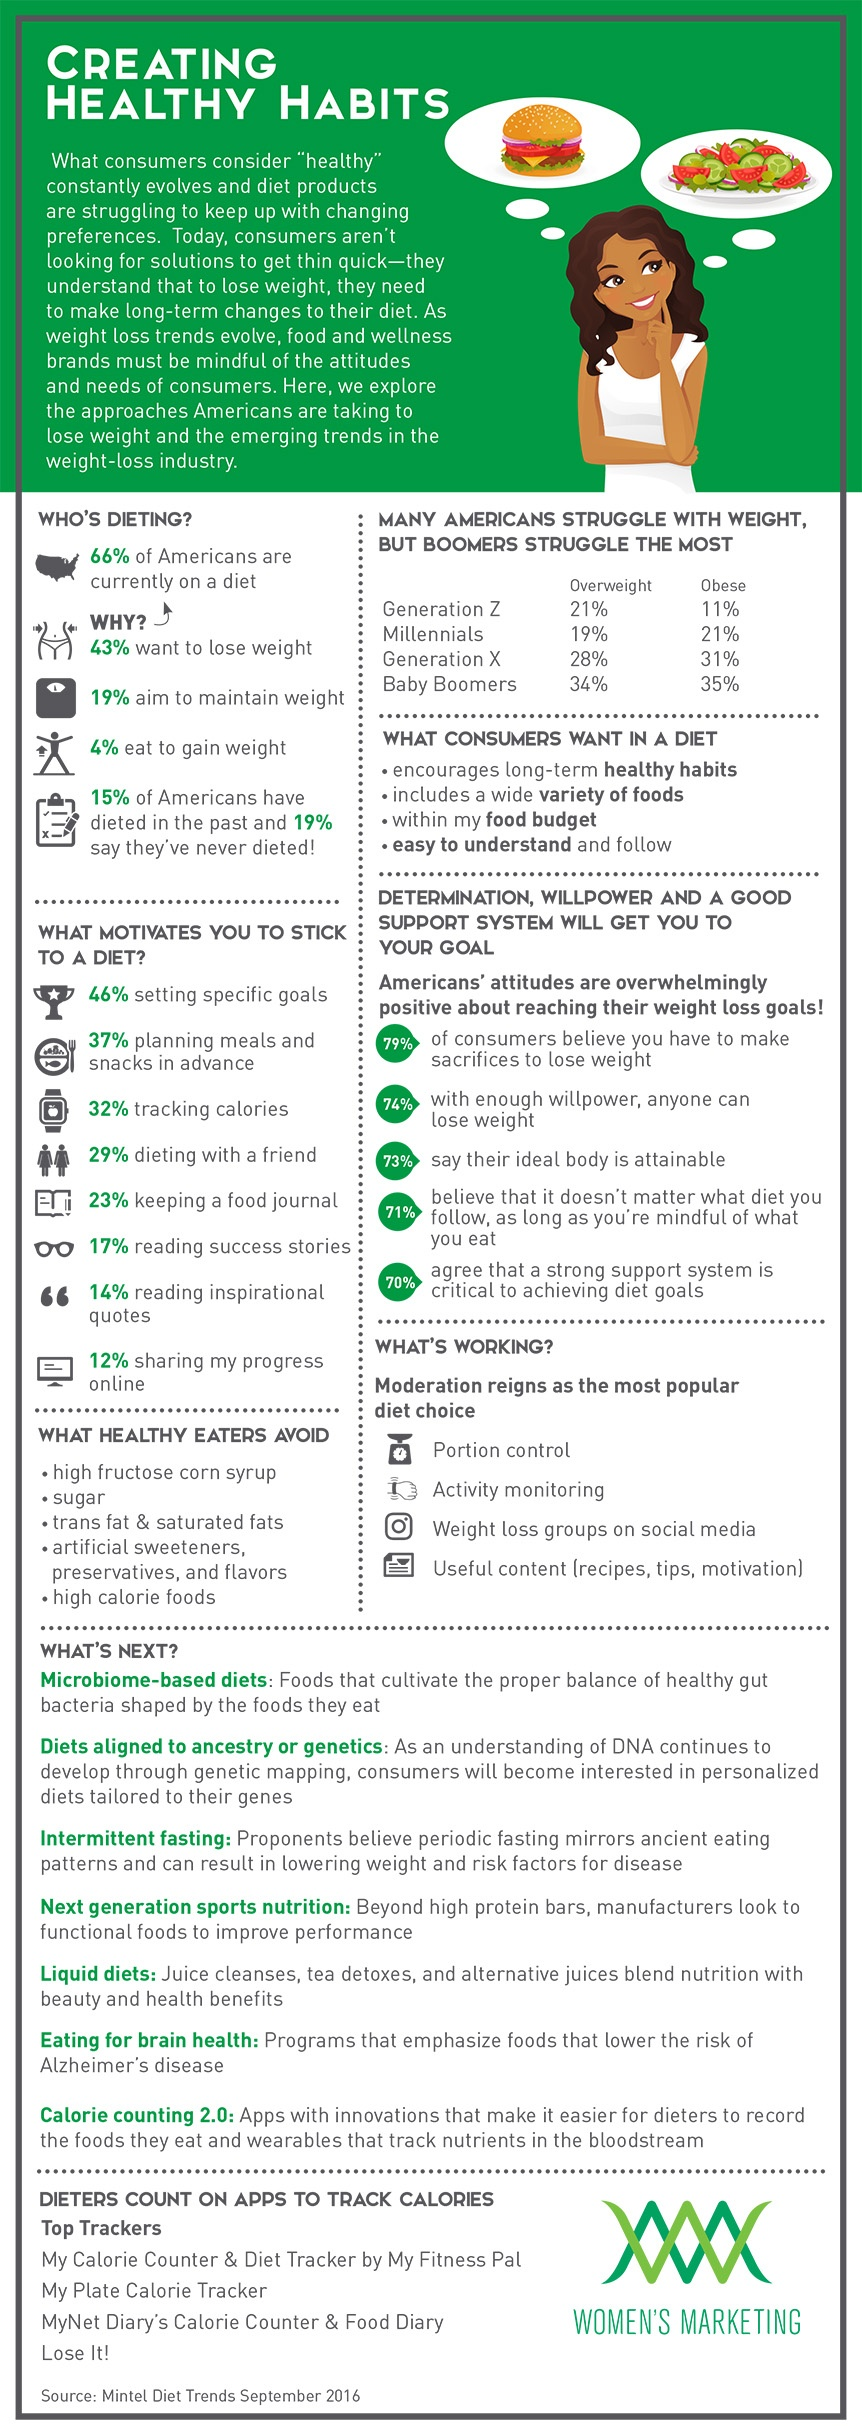 CreatingHealthyHabits_Infographic.jpg